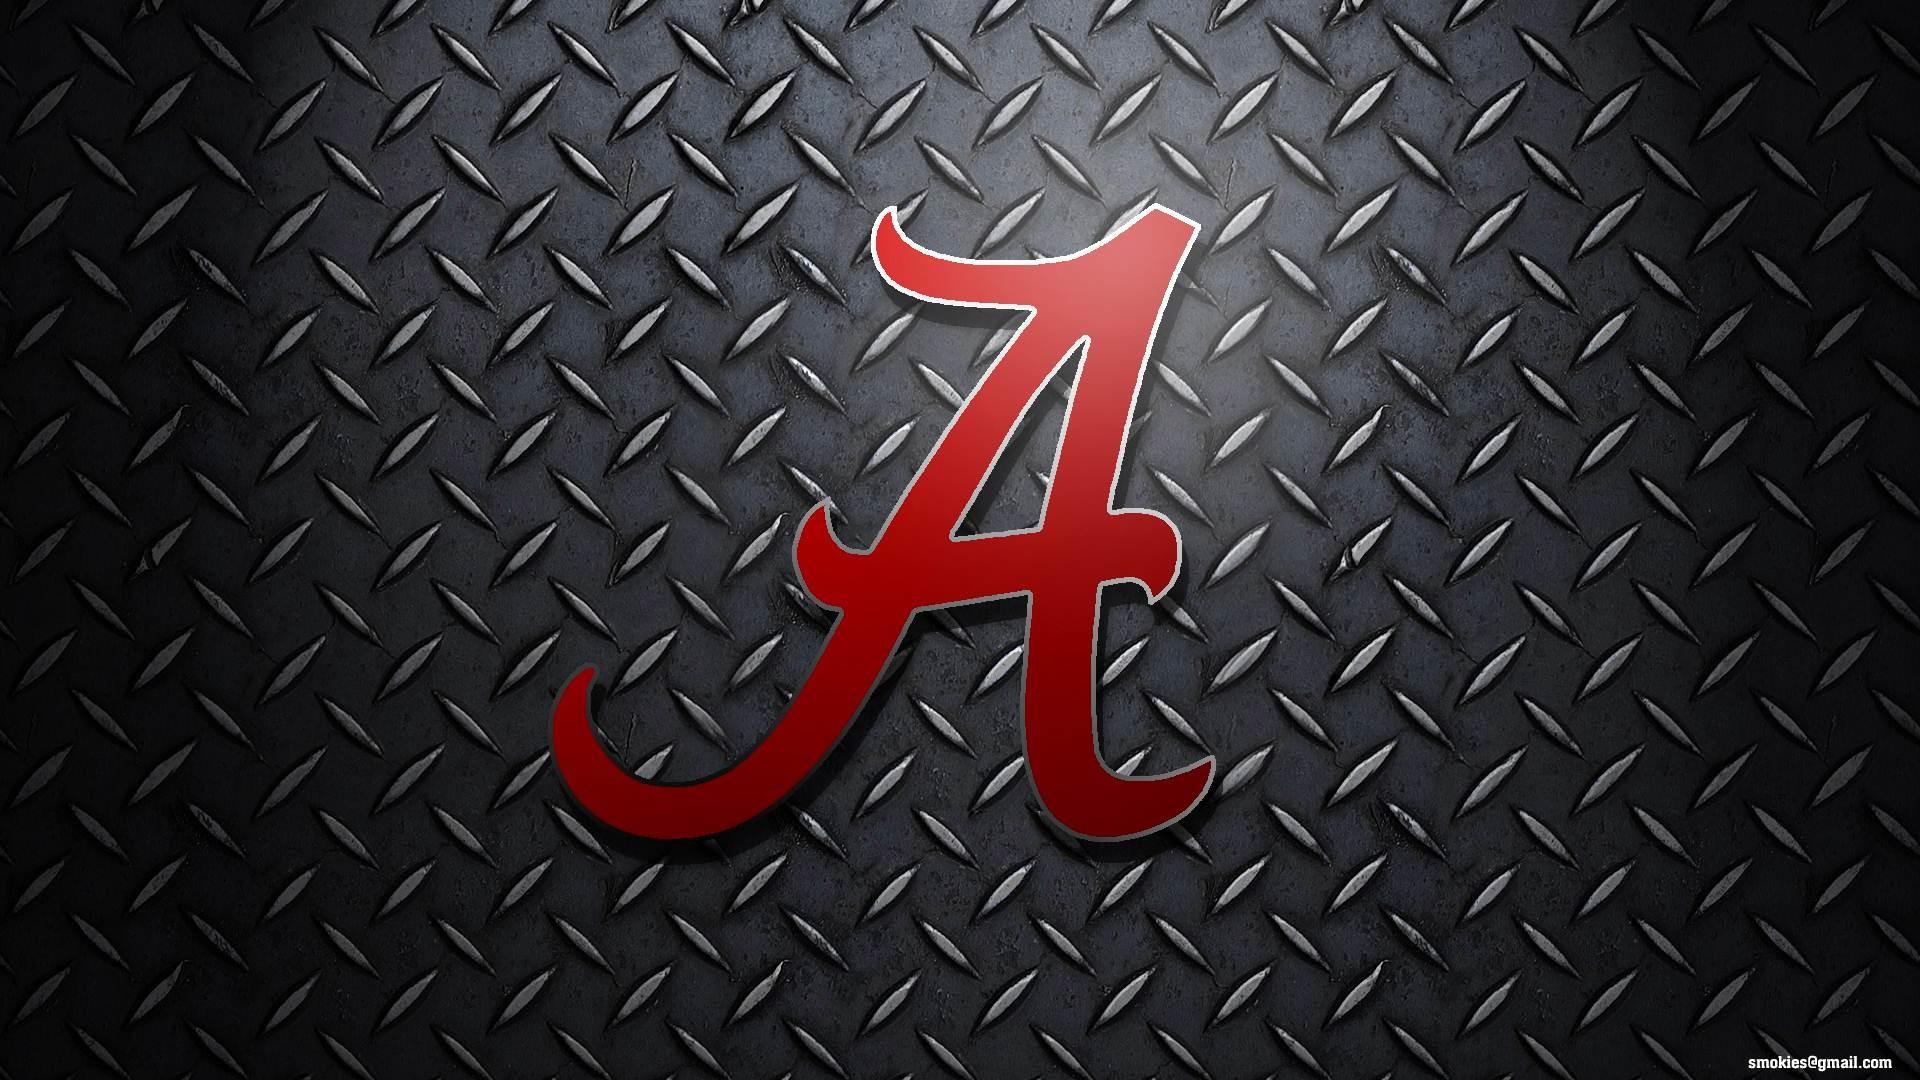 Free Alabama Crimson Tide Wallpaper | HD Wallpapers | Pinterest | Alabama  crimson tide, Hd wallpaper and Wallpaper